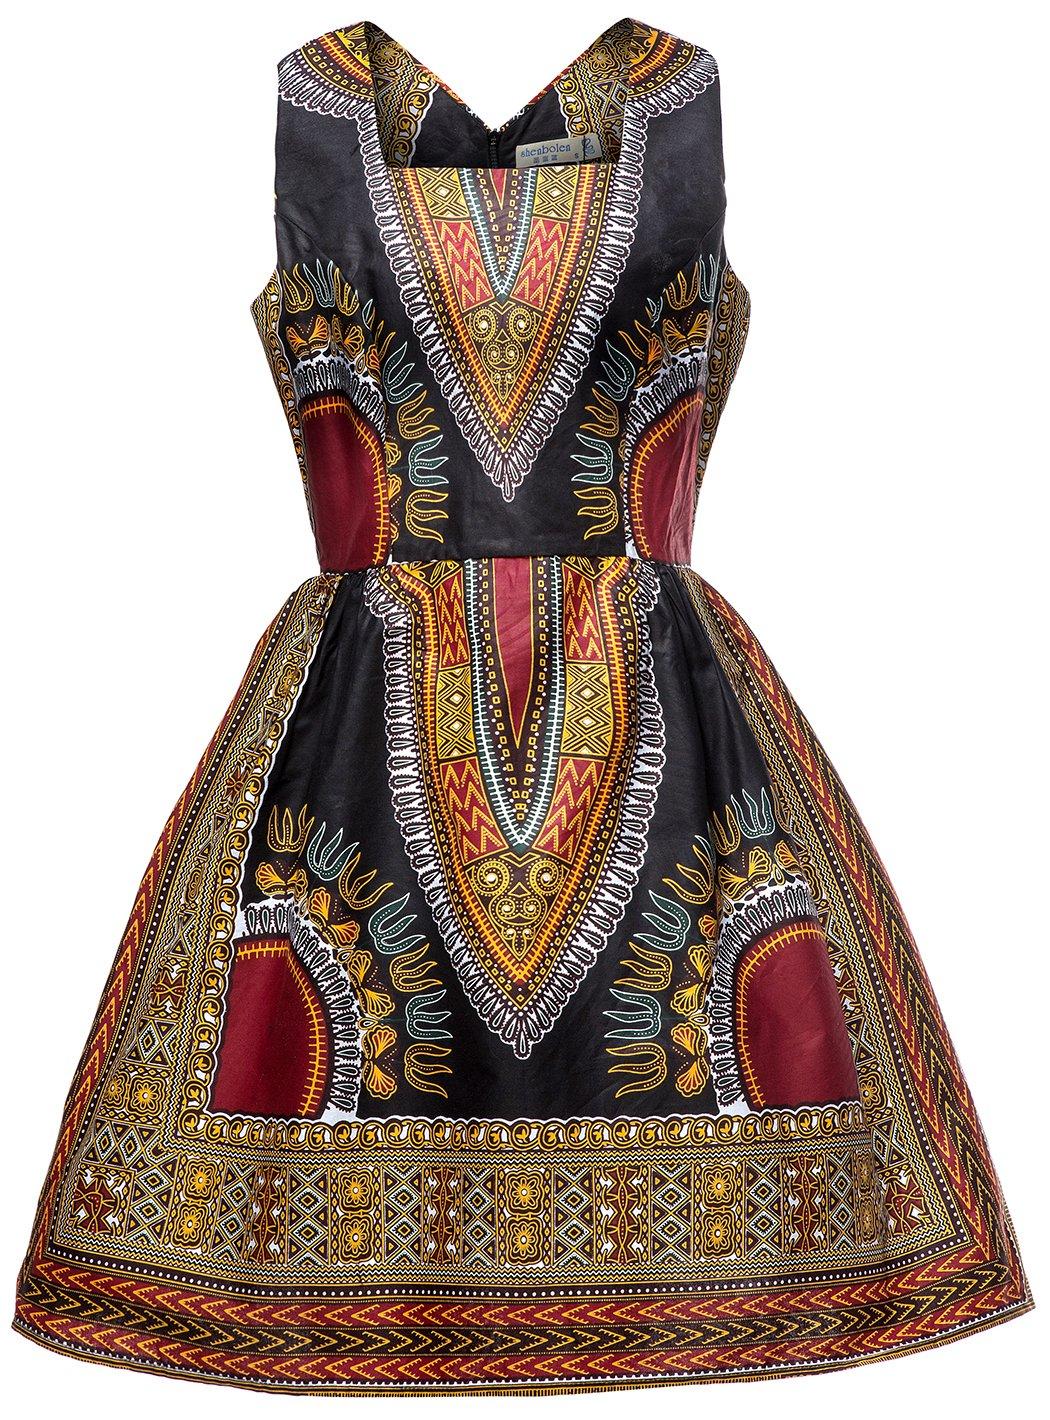 Shenbolen Woman African Print Dress Dashiki Traditional Dress Party Dresses (X-Large, D)